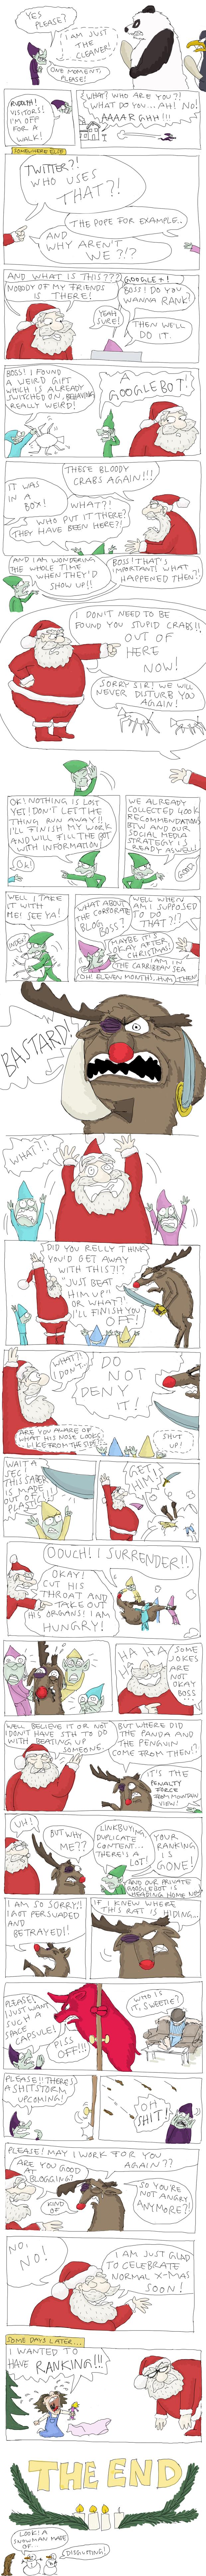 A SEO Christmas Story by Tobias Kerstin